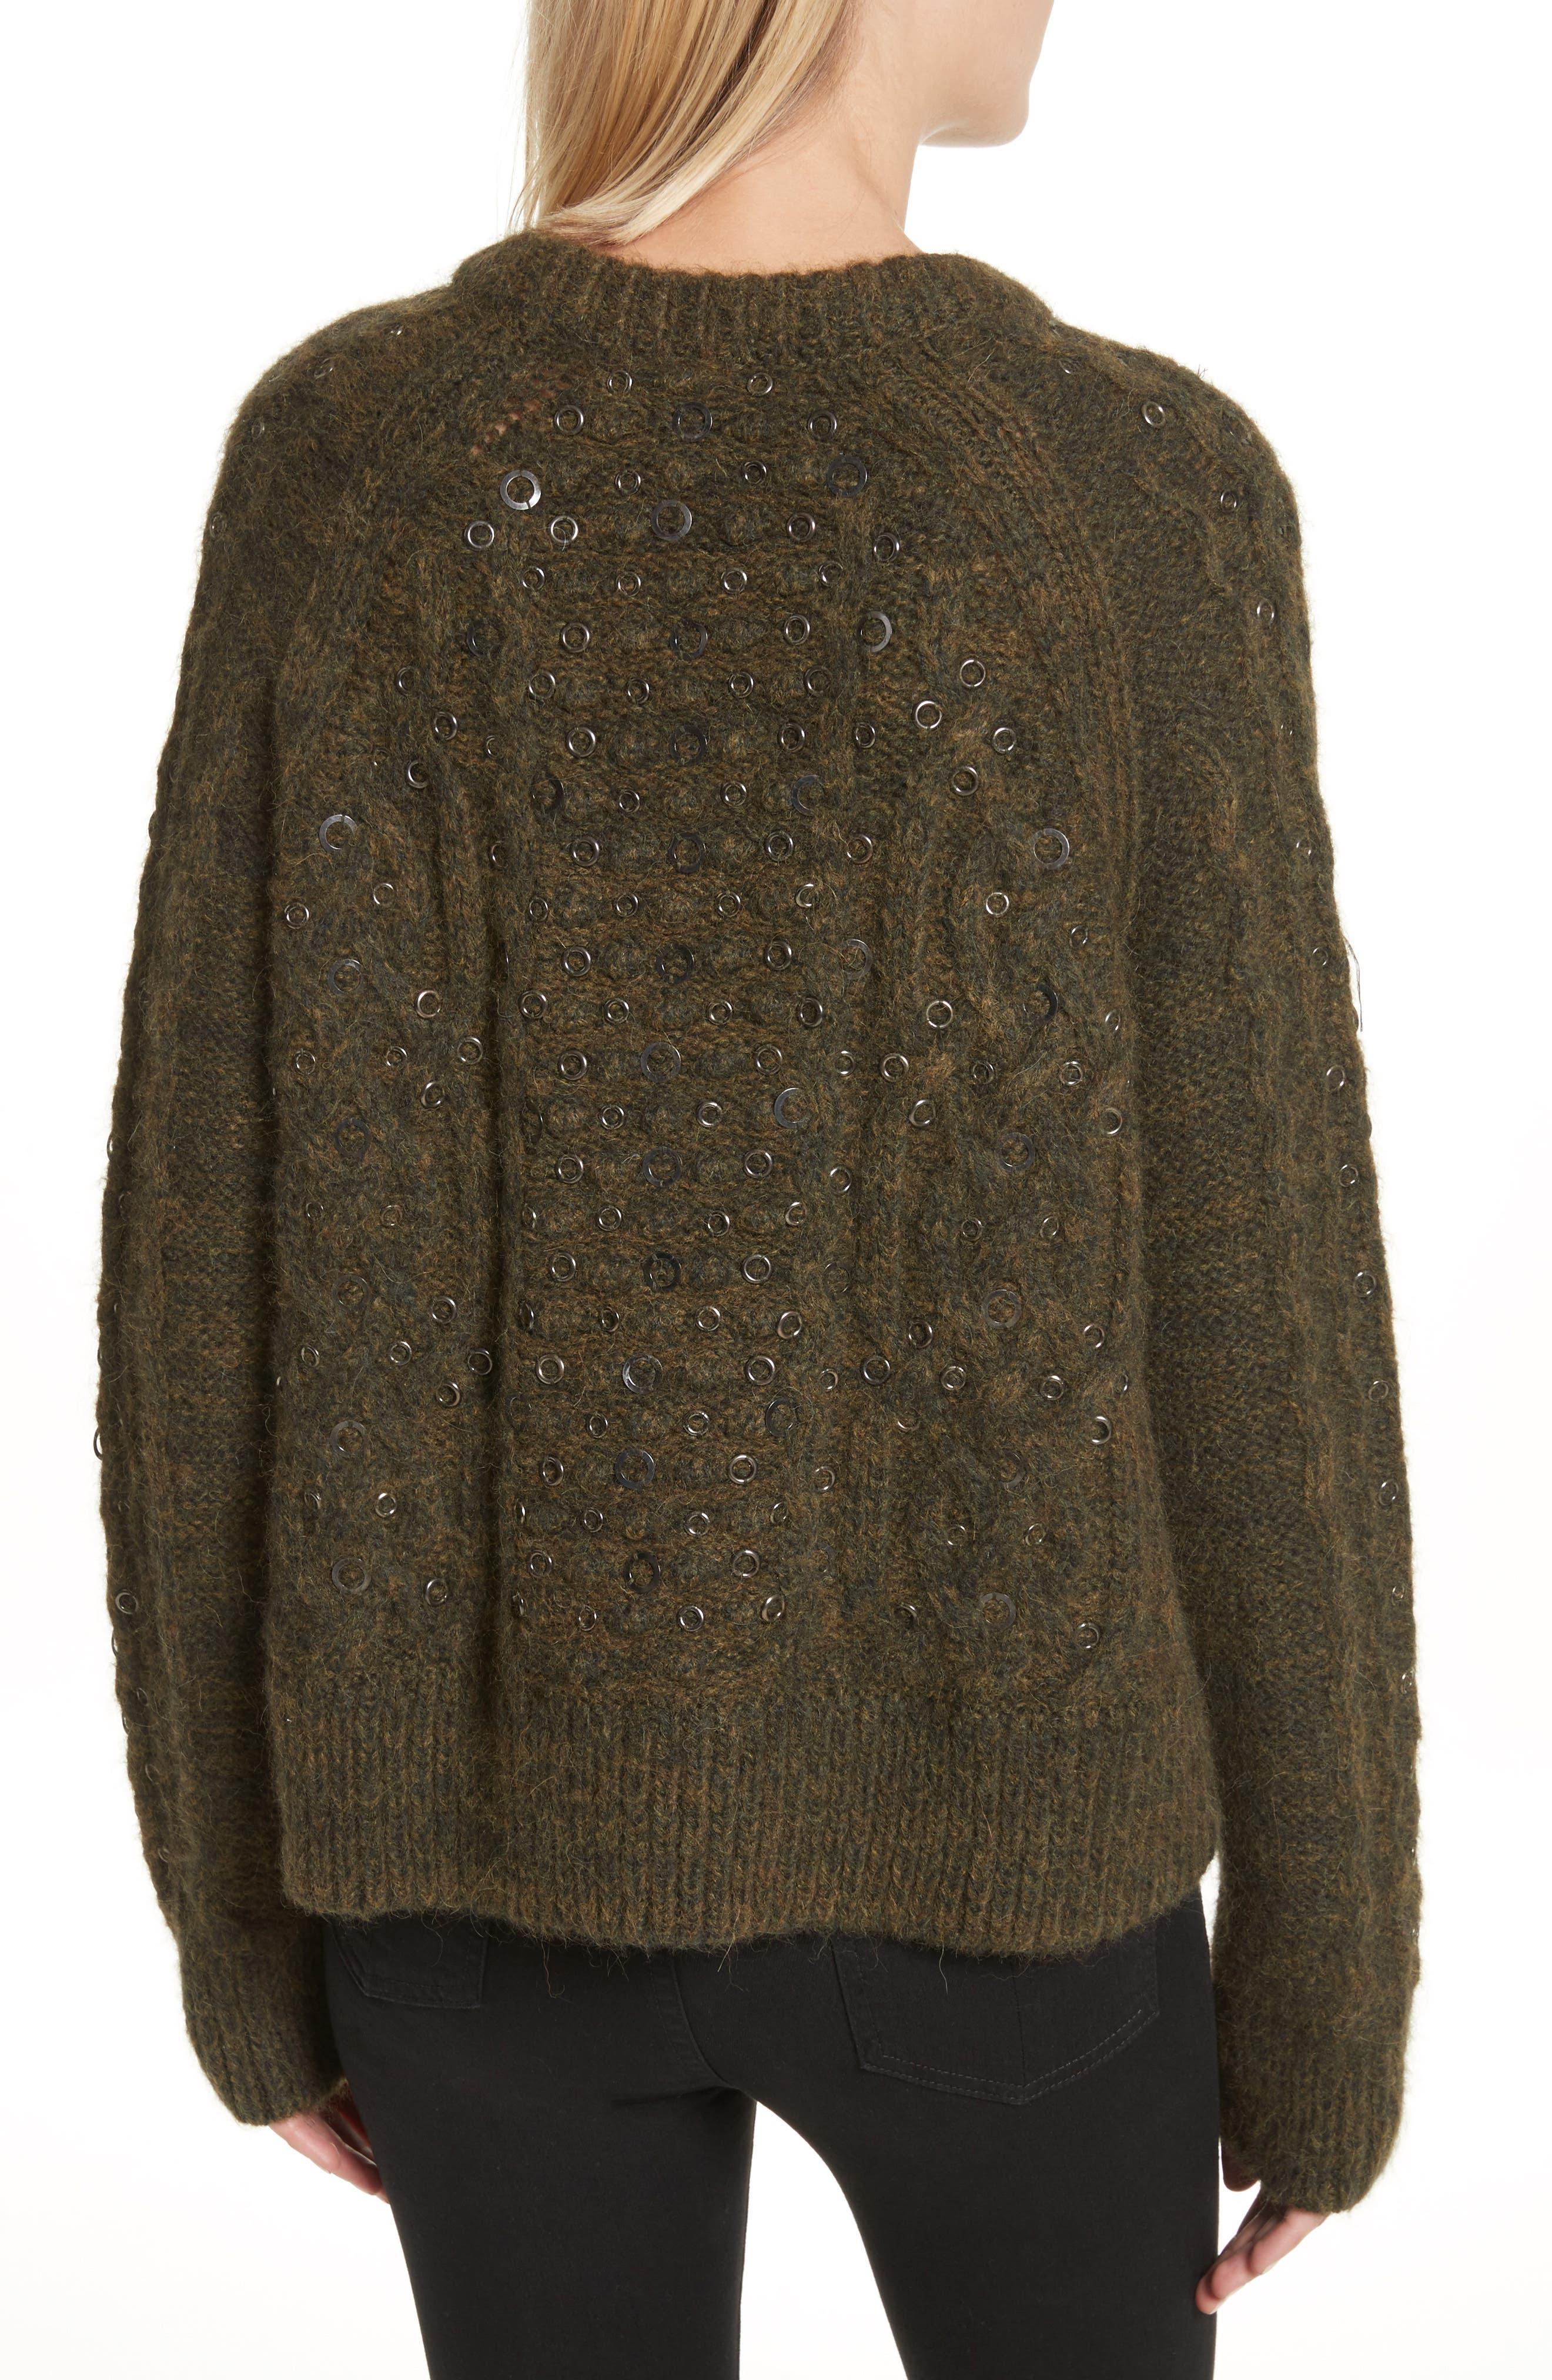 Jemima Wool & Alpaca Blend Beaded Sweater,                             Alternate thumbnail 2, color,                             Army